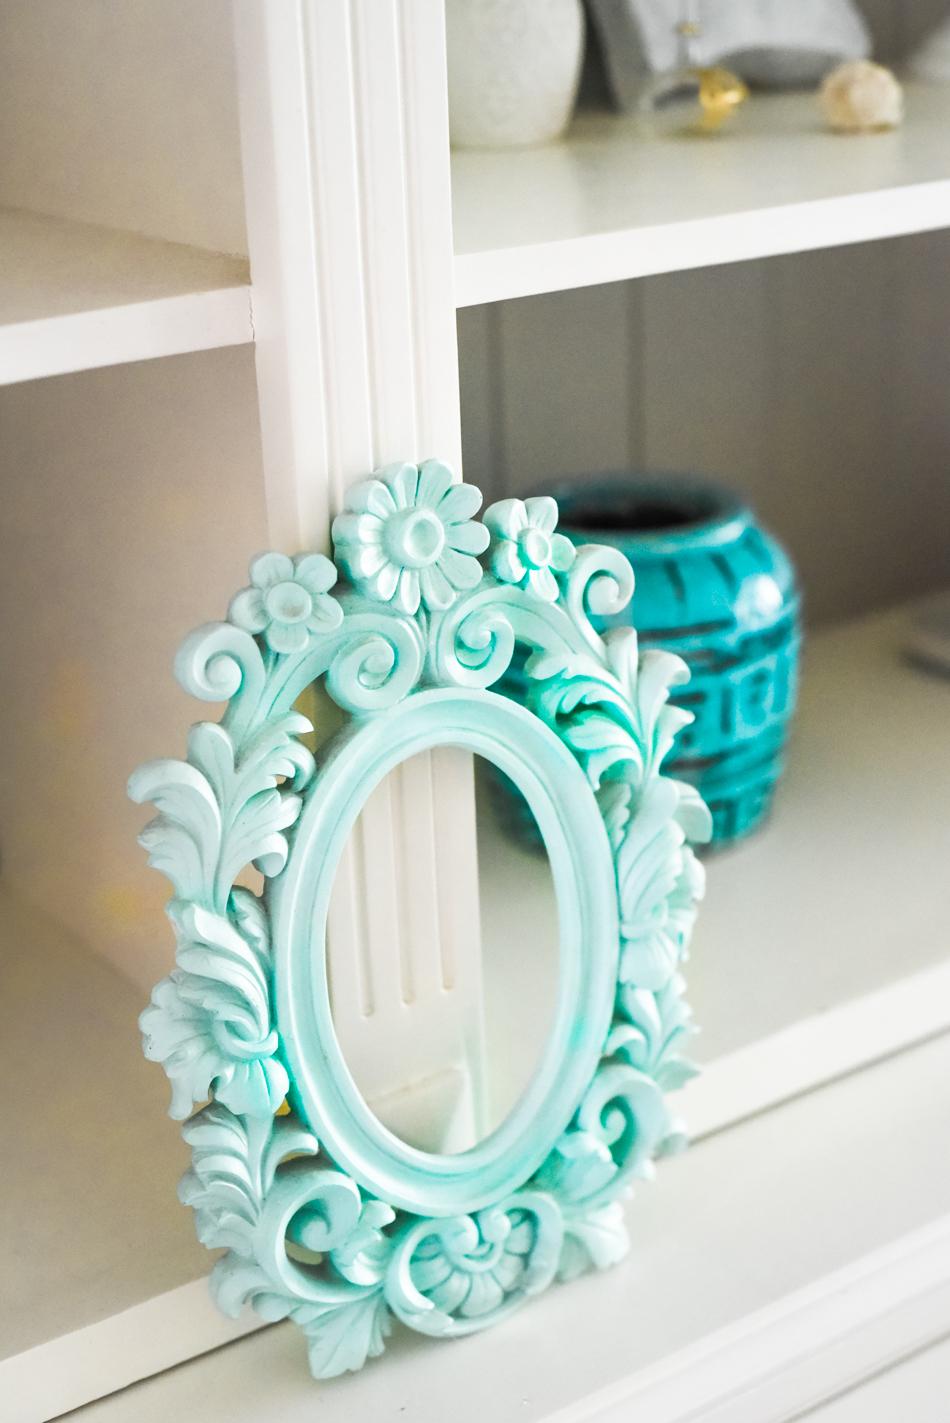 Summer-House-Feeling-With-Blue-and-gold-Decor-AnaisStoelen-20.jpg